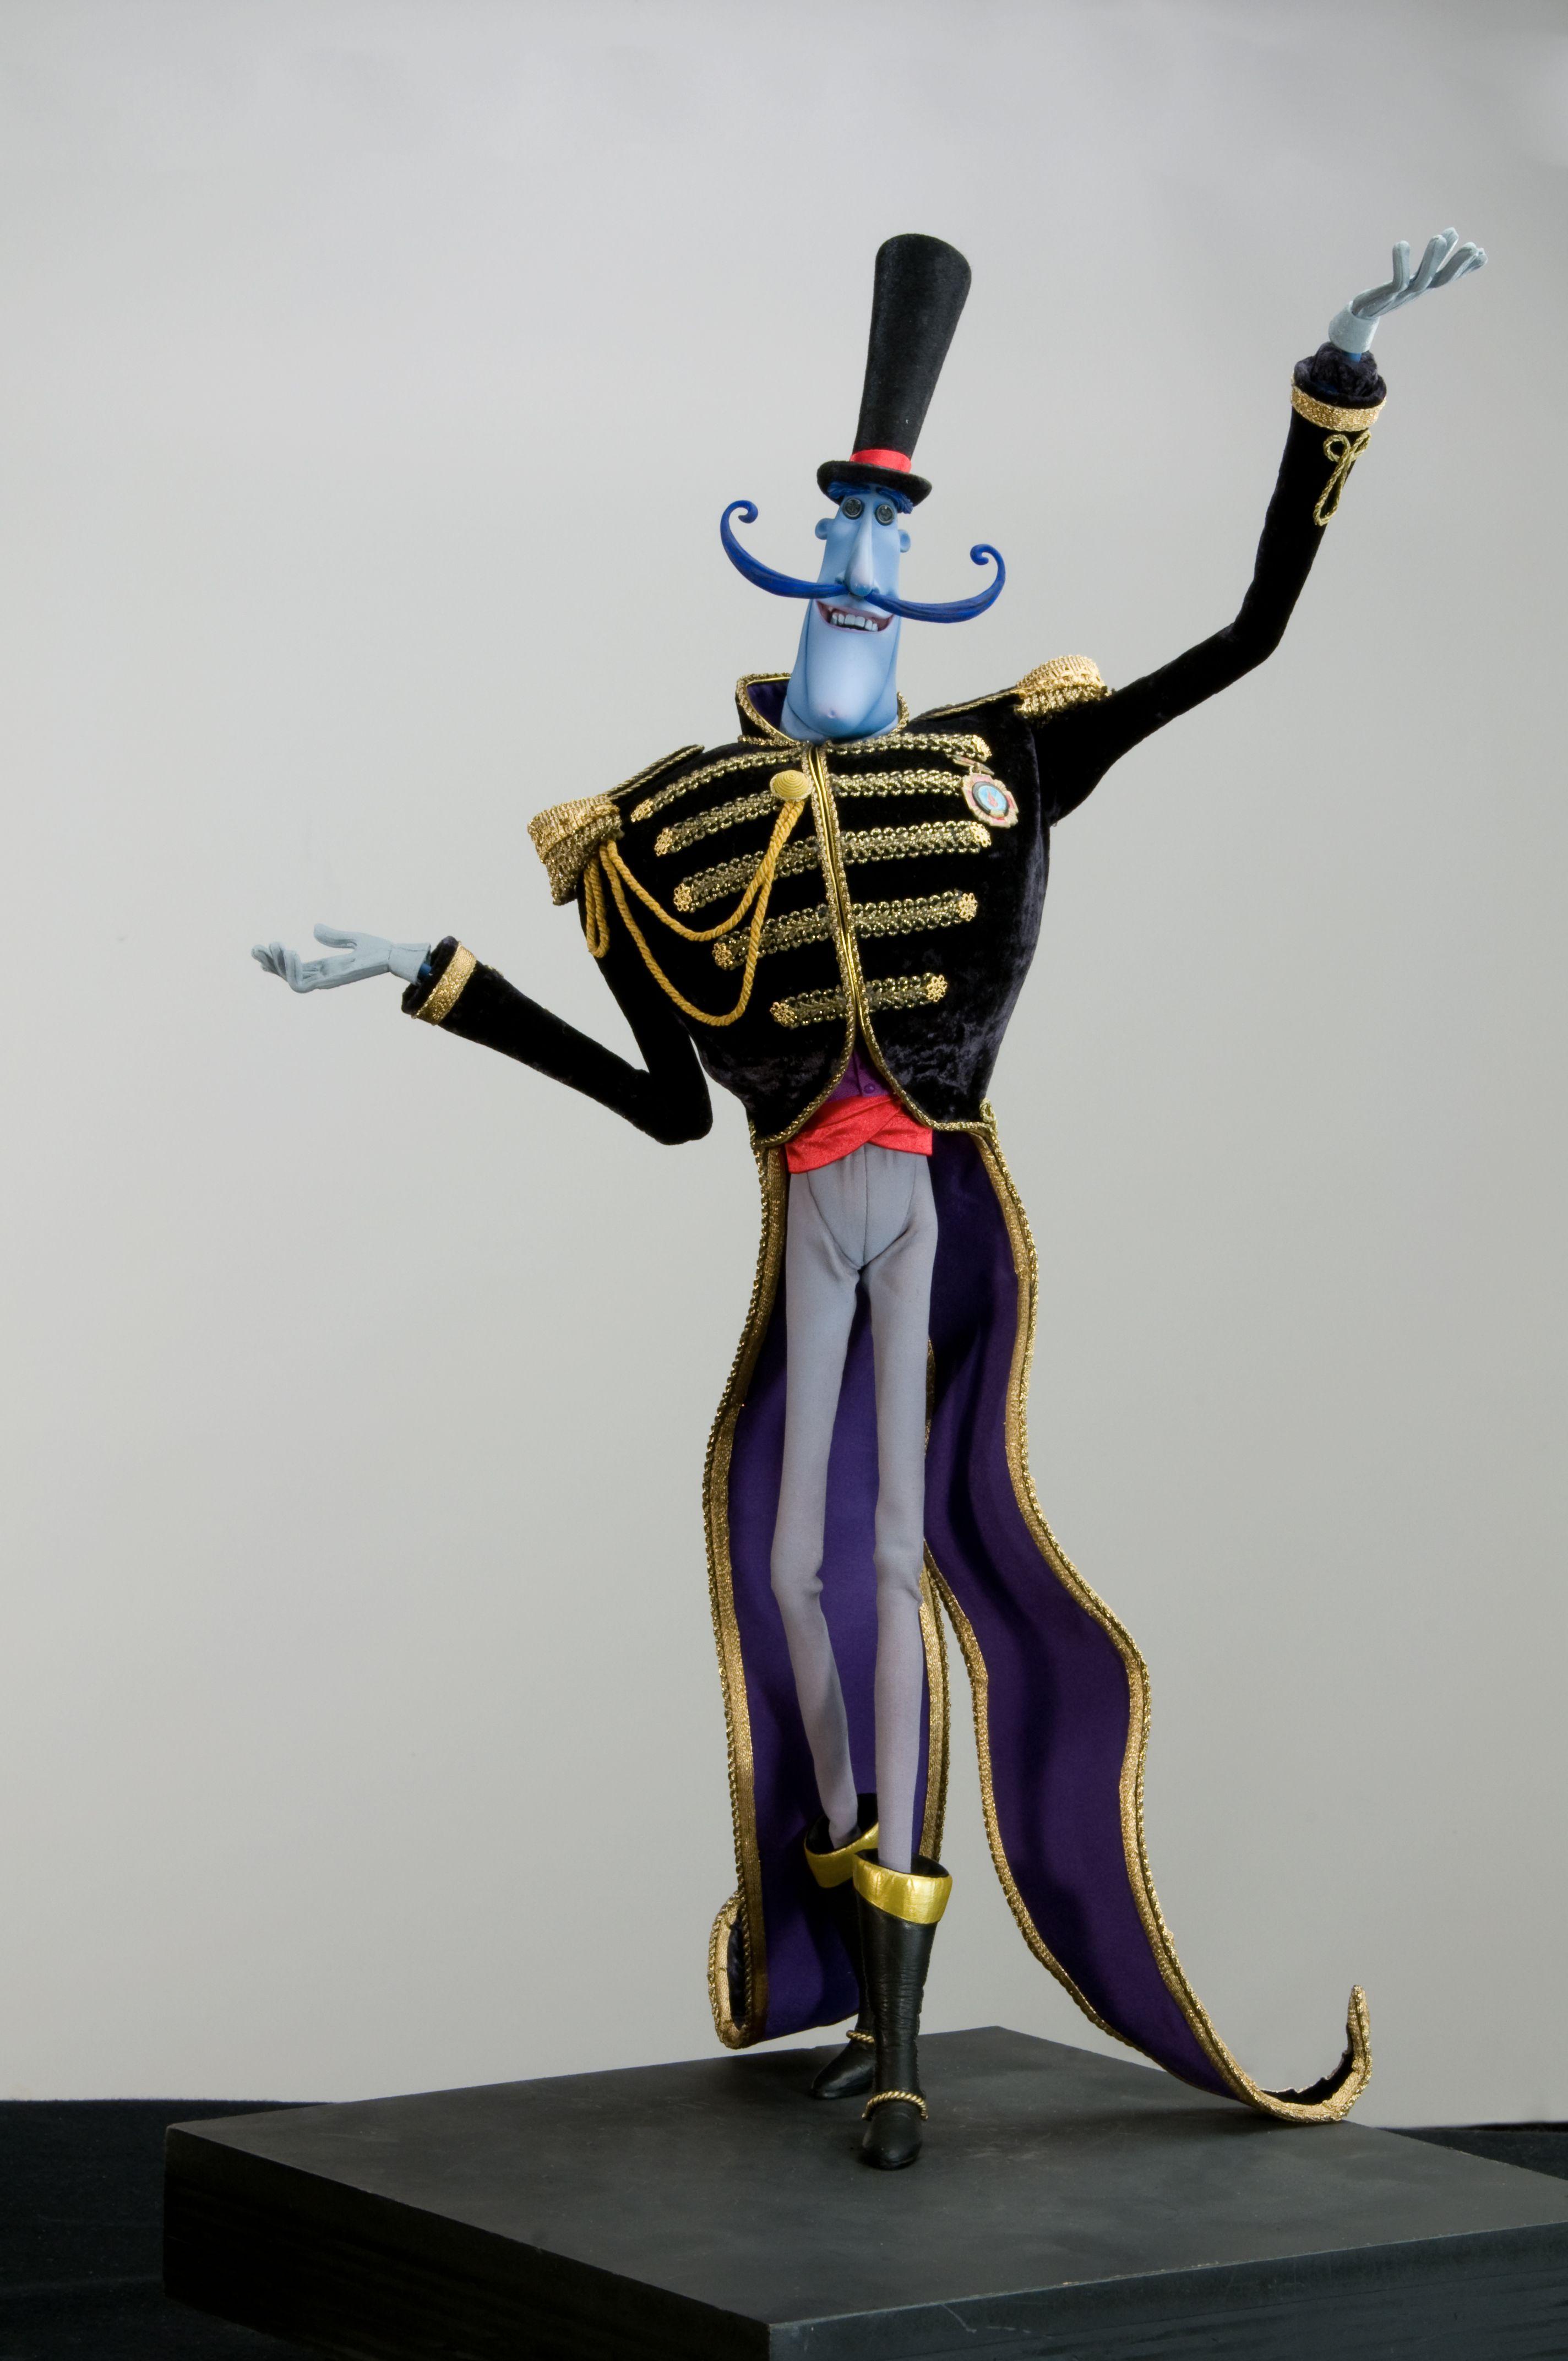 The Other Mr Bobinski Coraline Aesthetic Coraline Jones Coraline